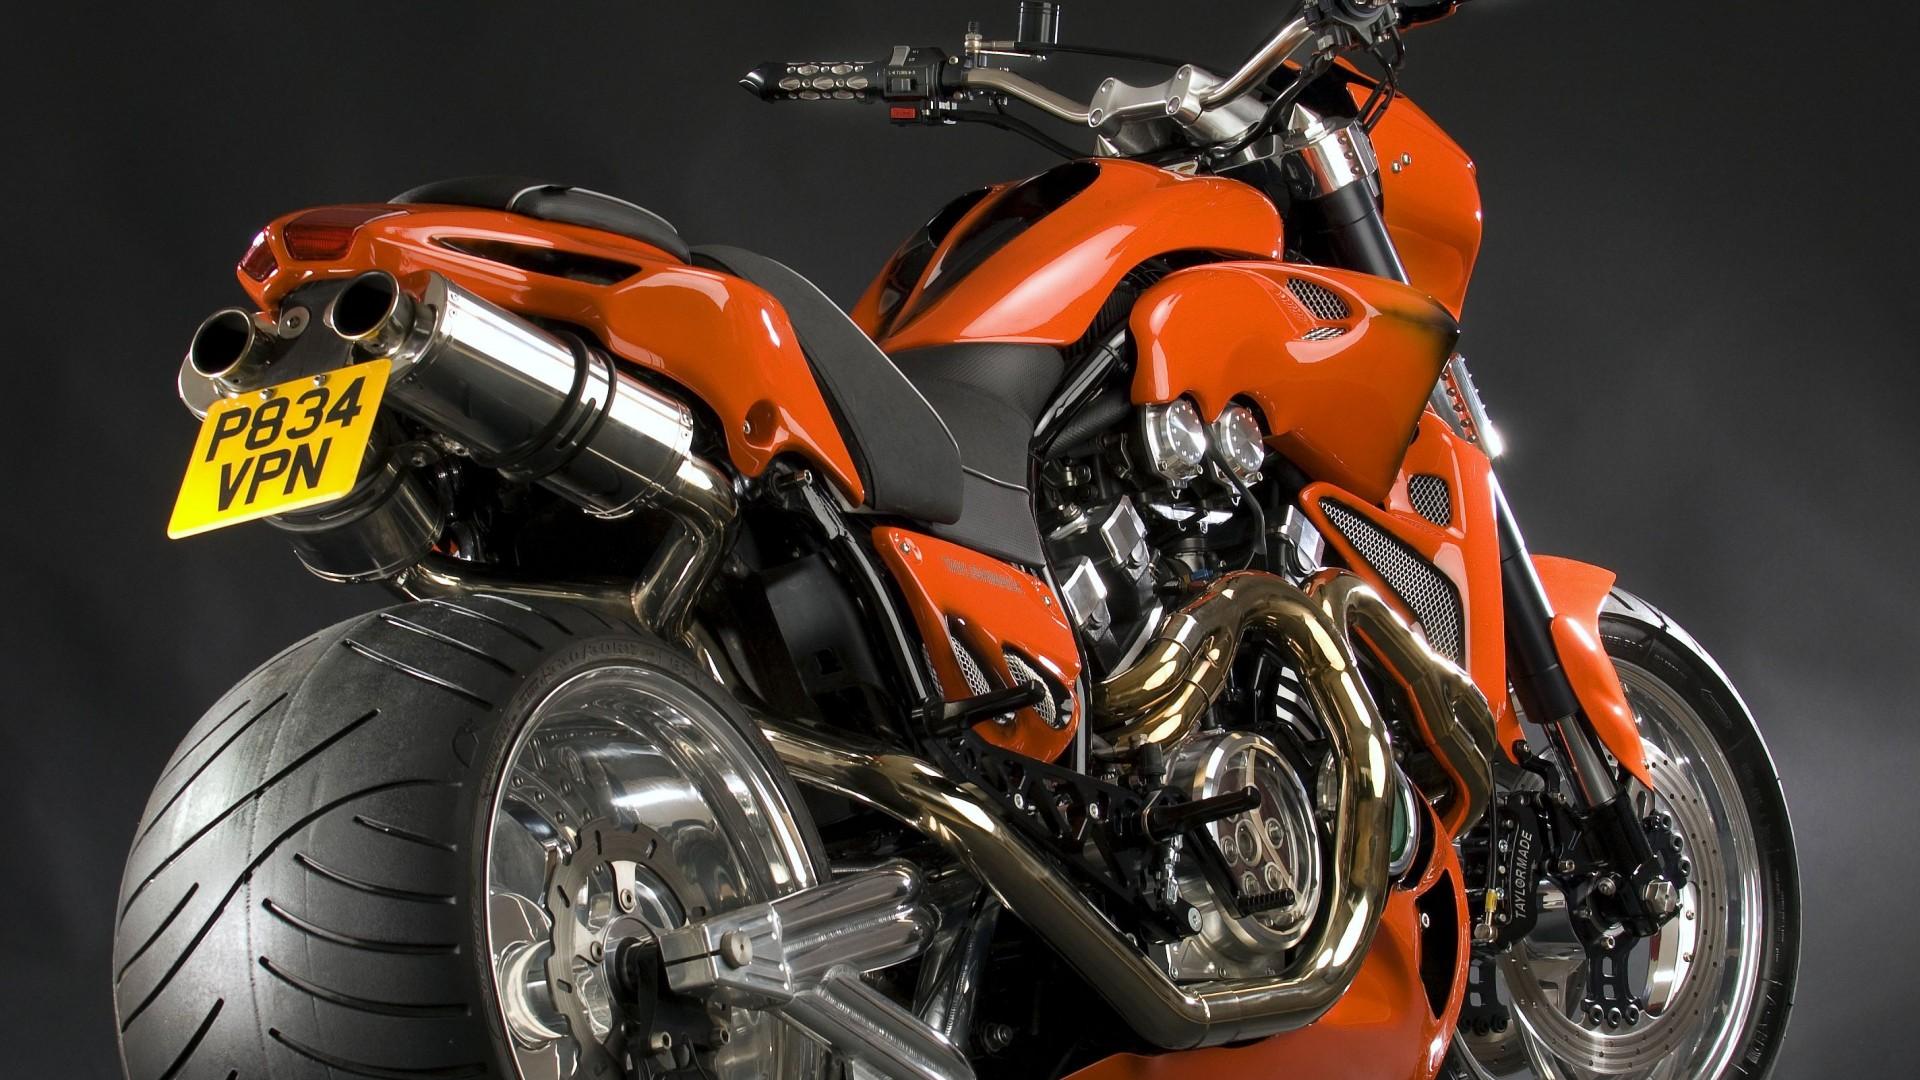 Yamaha VMAX Custom Tuning V Max Motorcycle Cruiser